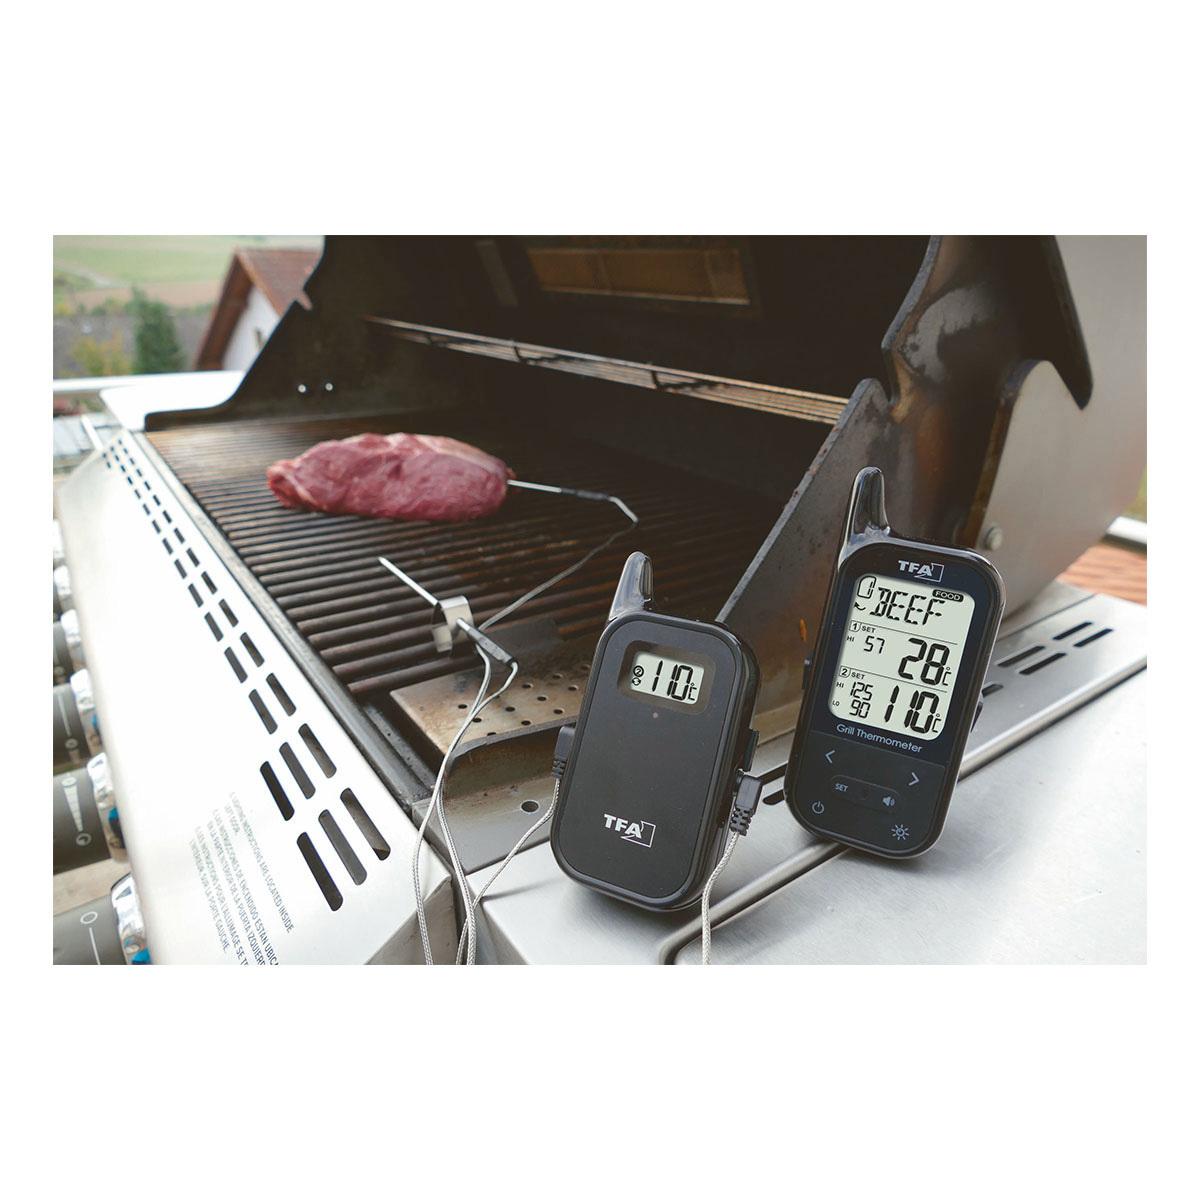 14-1511-01-funk-grill-braten-ofenthermometer-küchen-chef-twin-anwendung2-1200x1200px.jpg